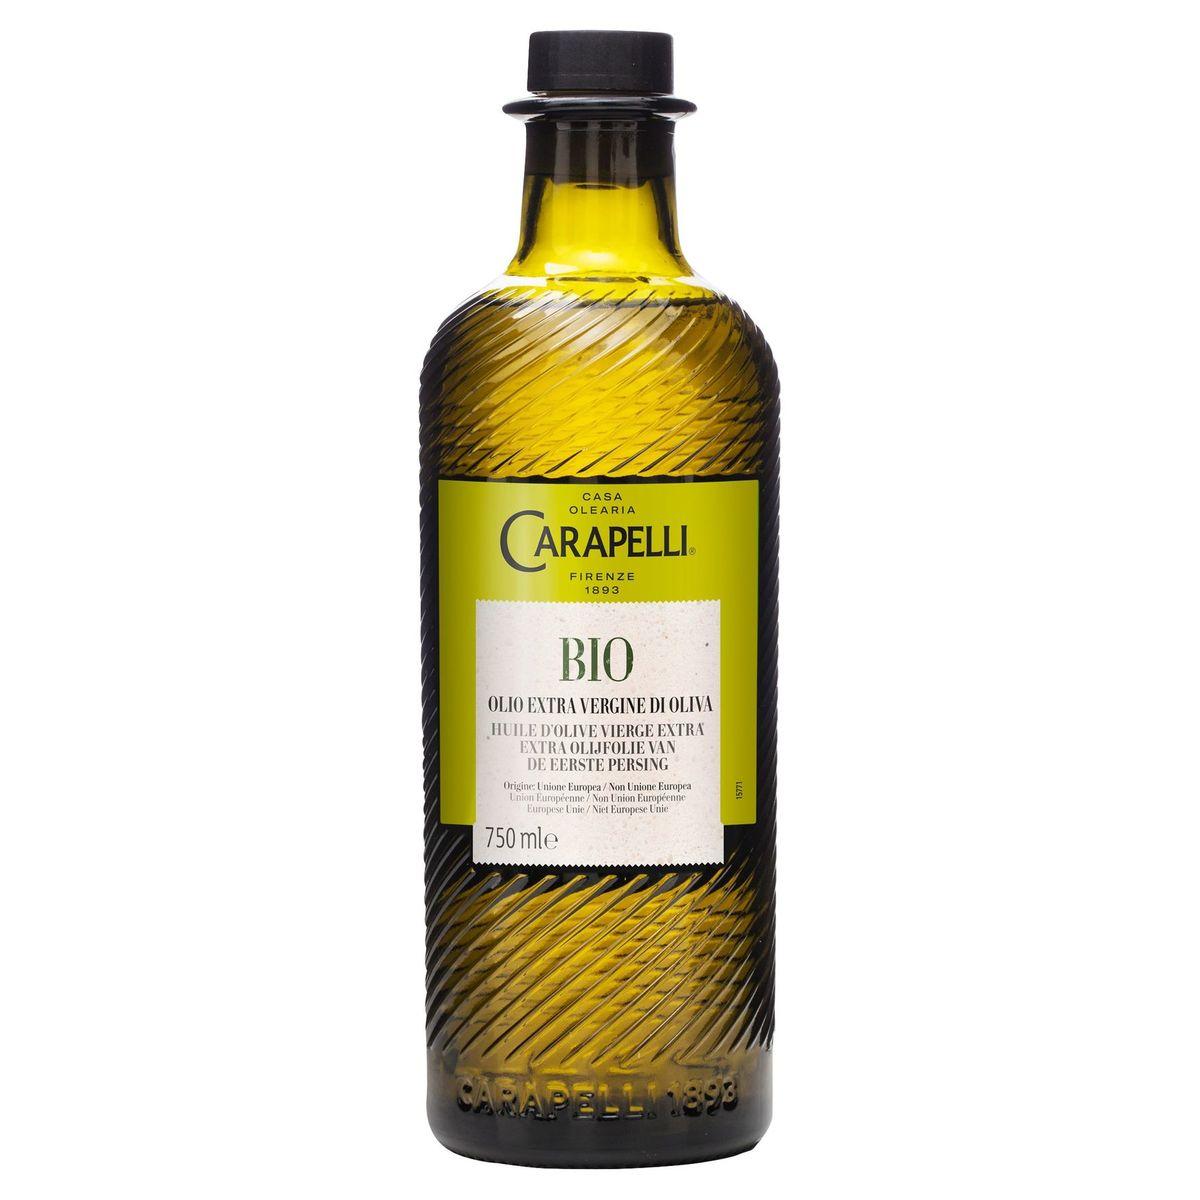 Carapelli Bio Huile d'Olive Vierge Extra 750 ml